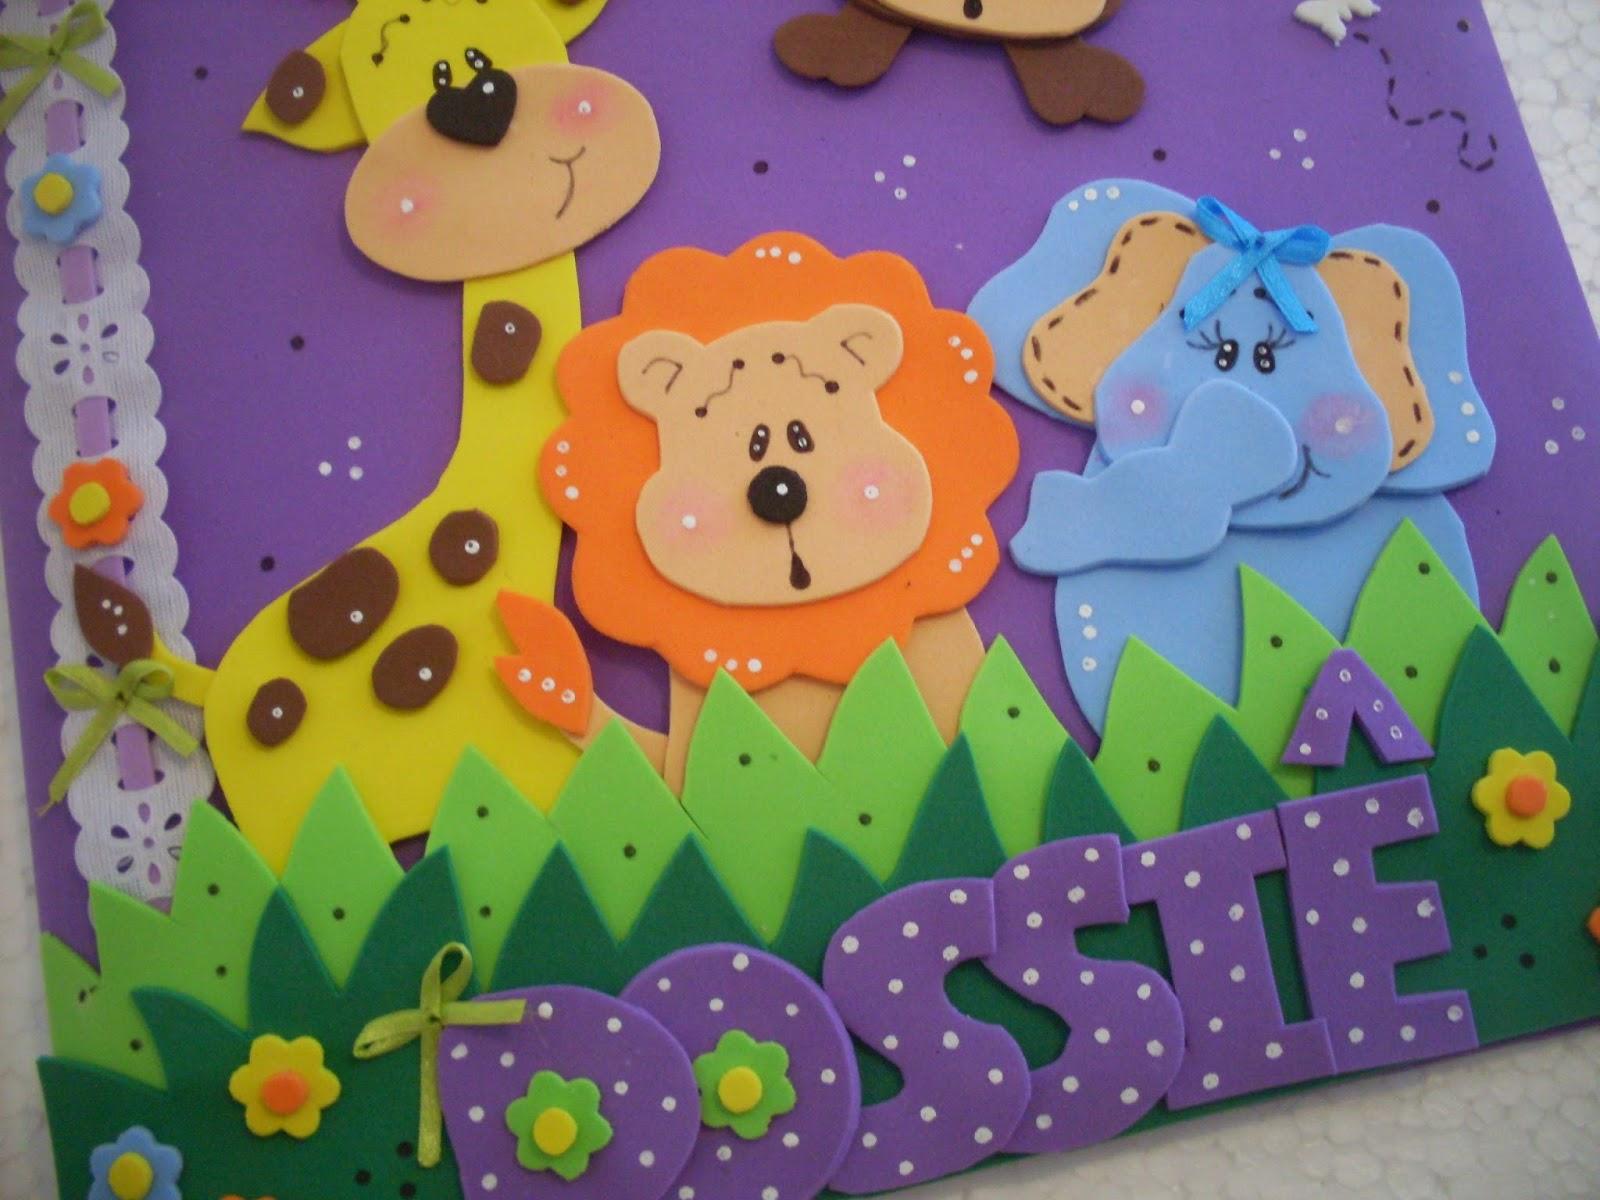 Decorado para aulas de jardin maternal decorado para aulas for Decoracion jardin maternal